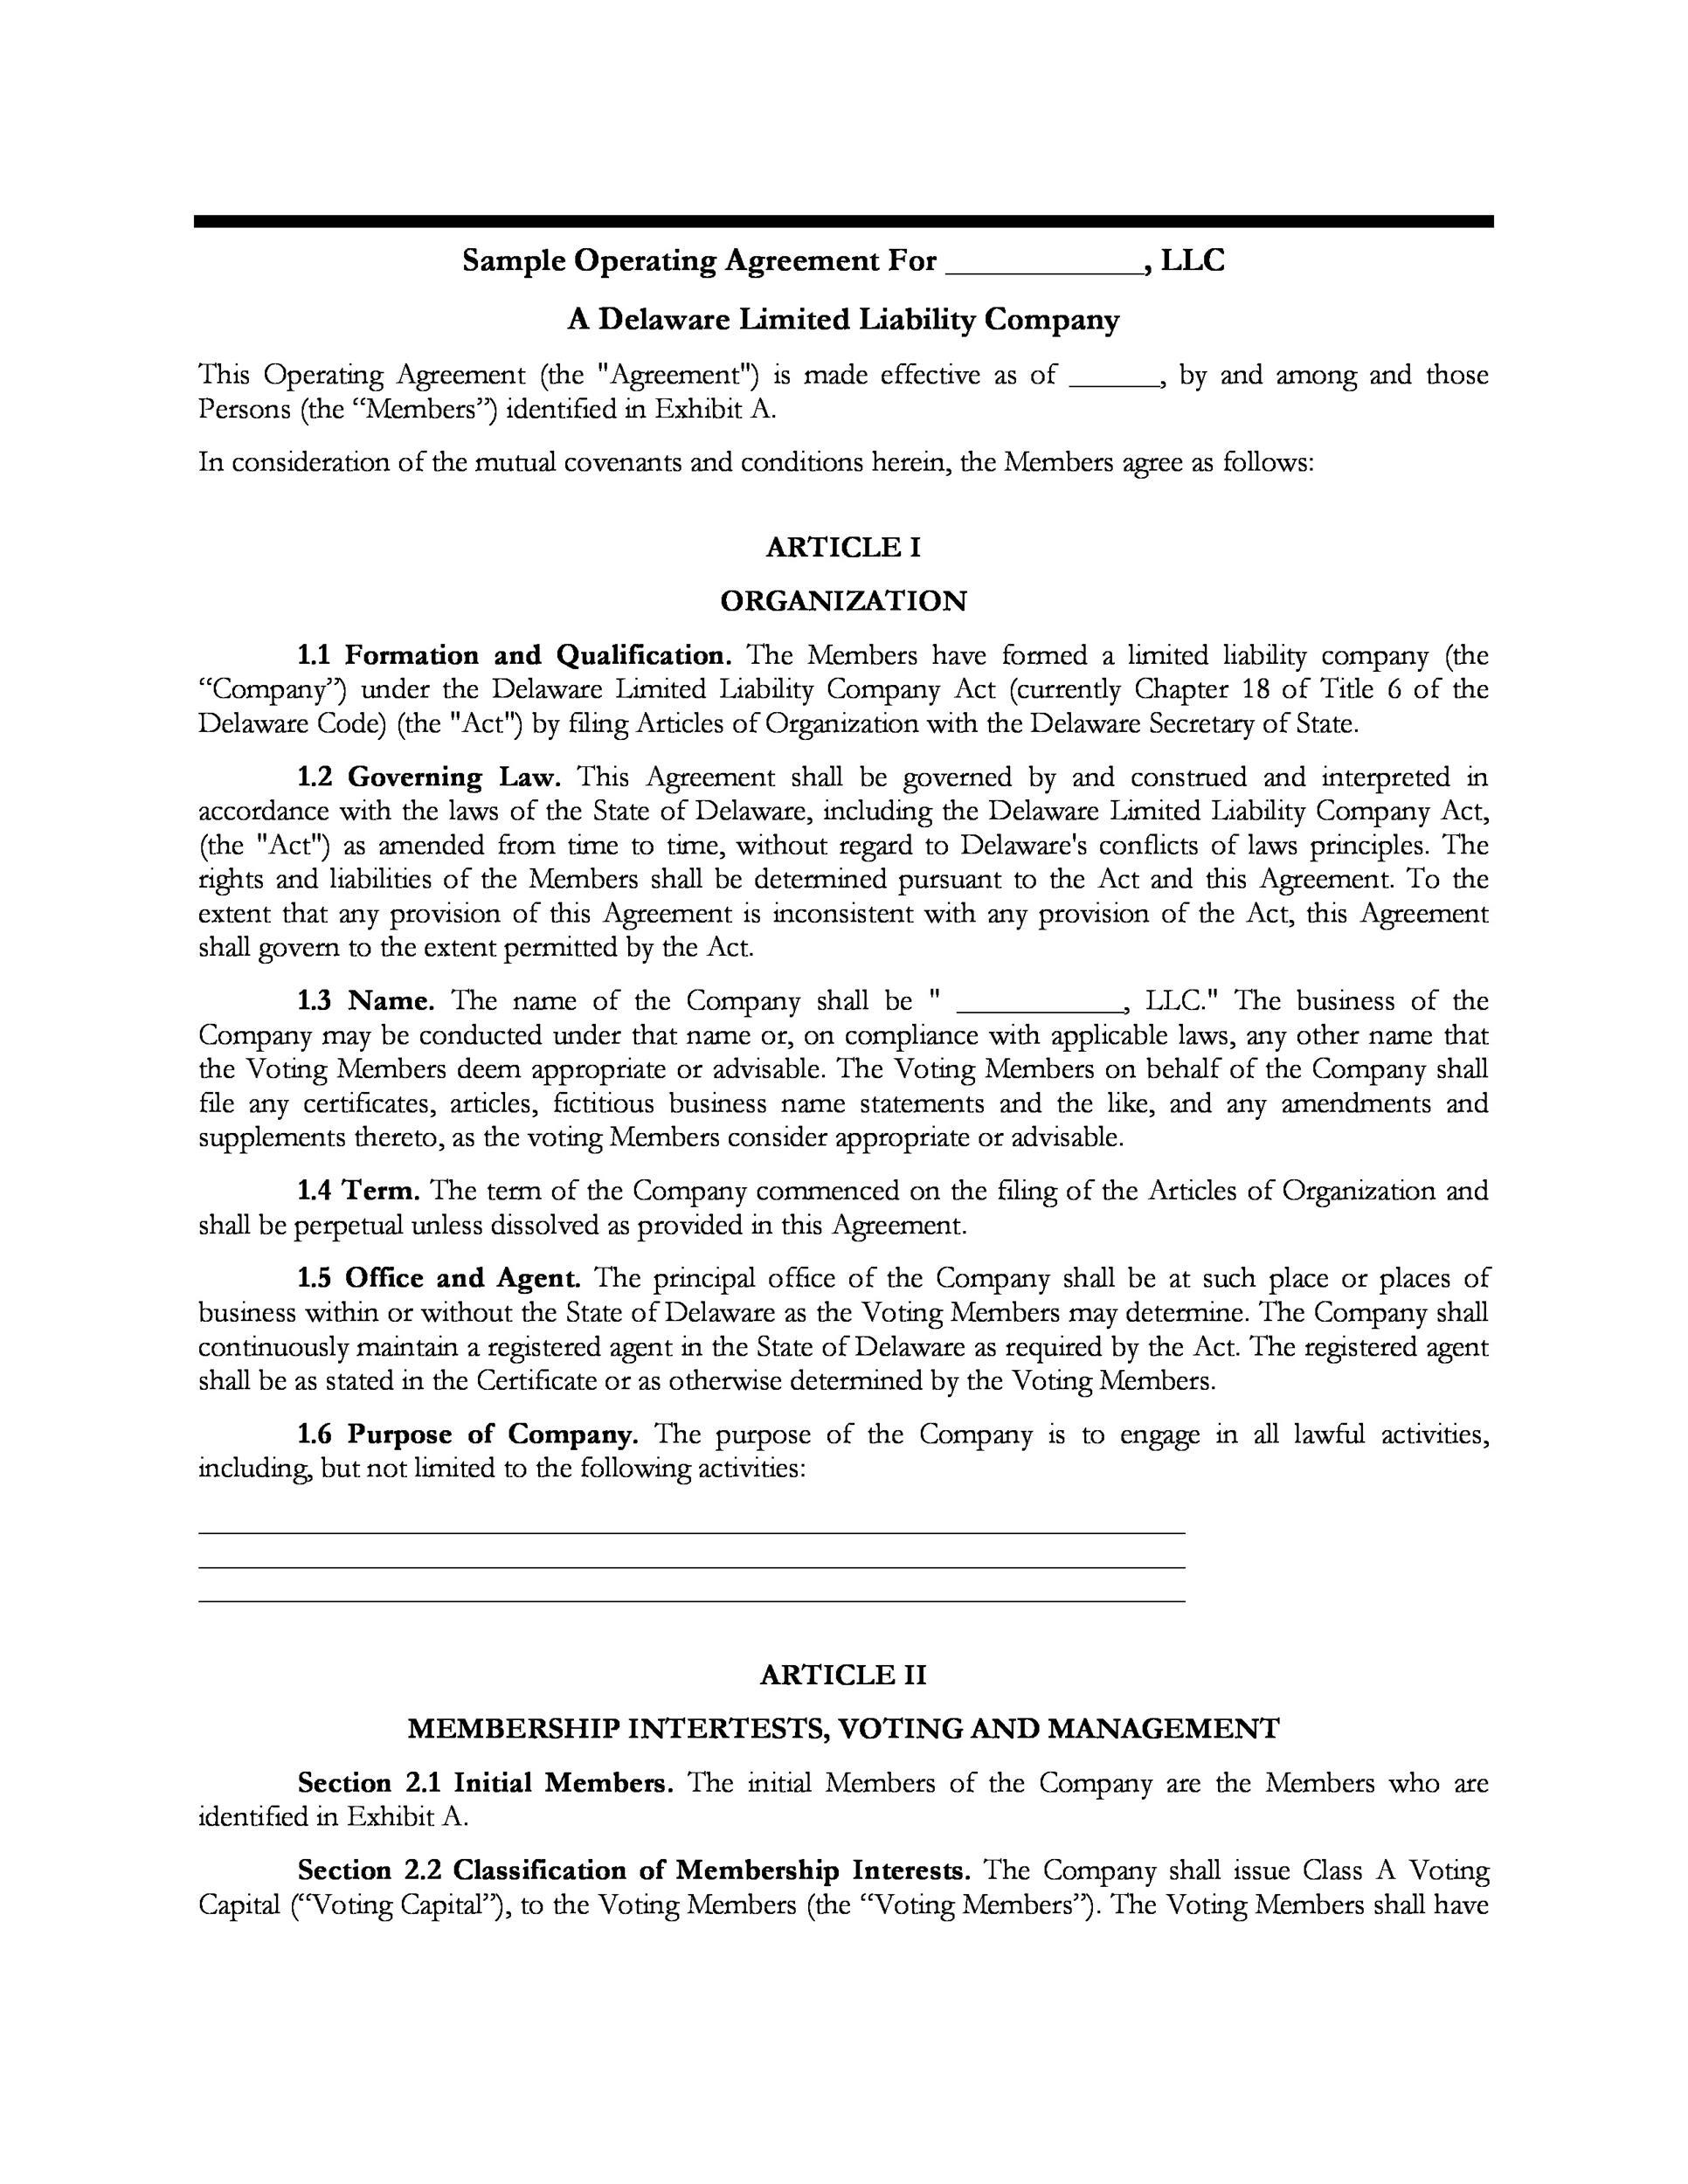 30 Professional LLC Operating Agreement Templates ᐅ Template Lab